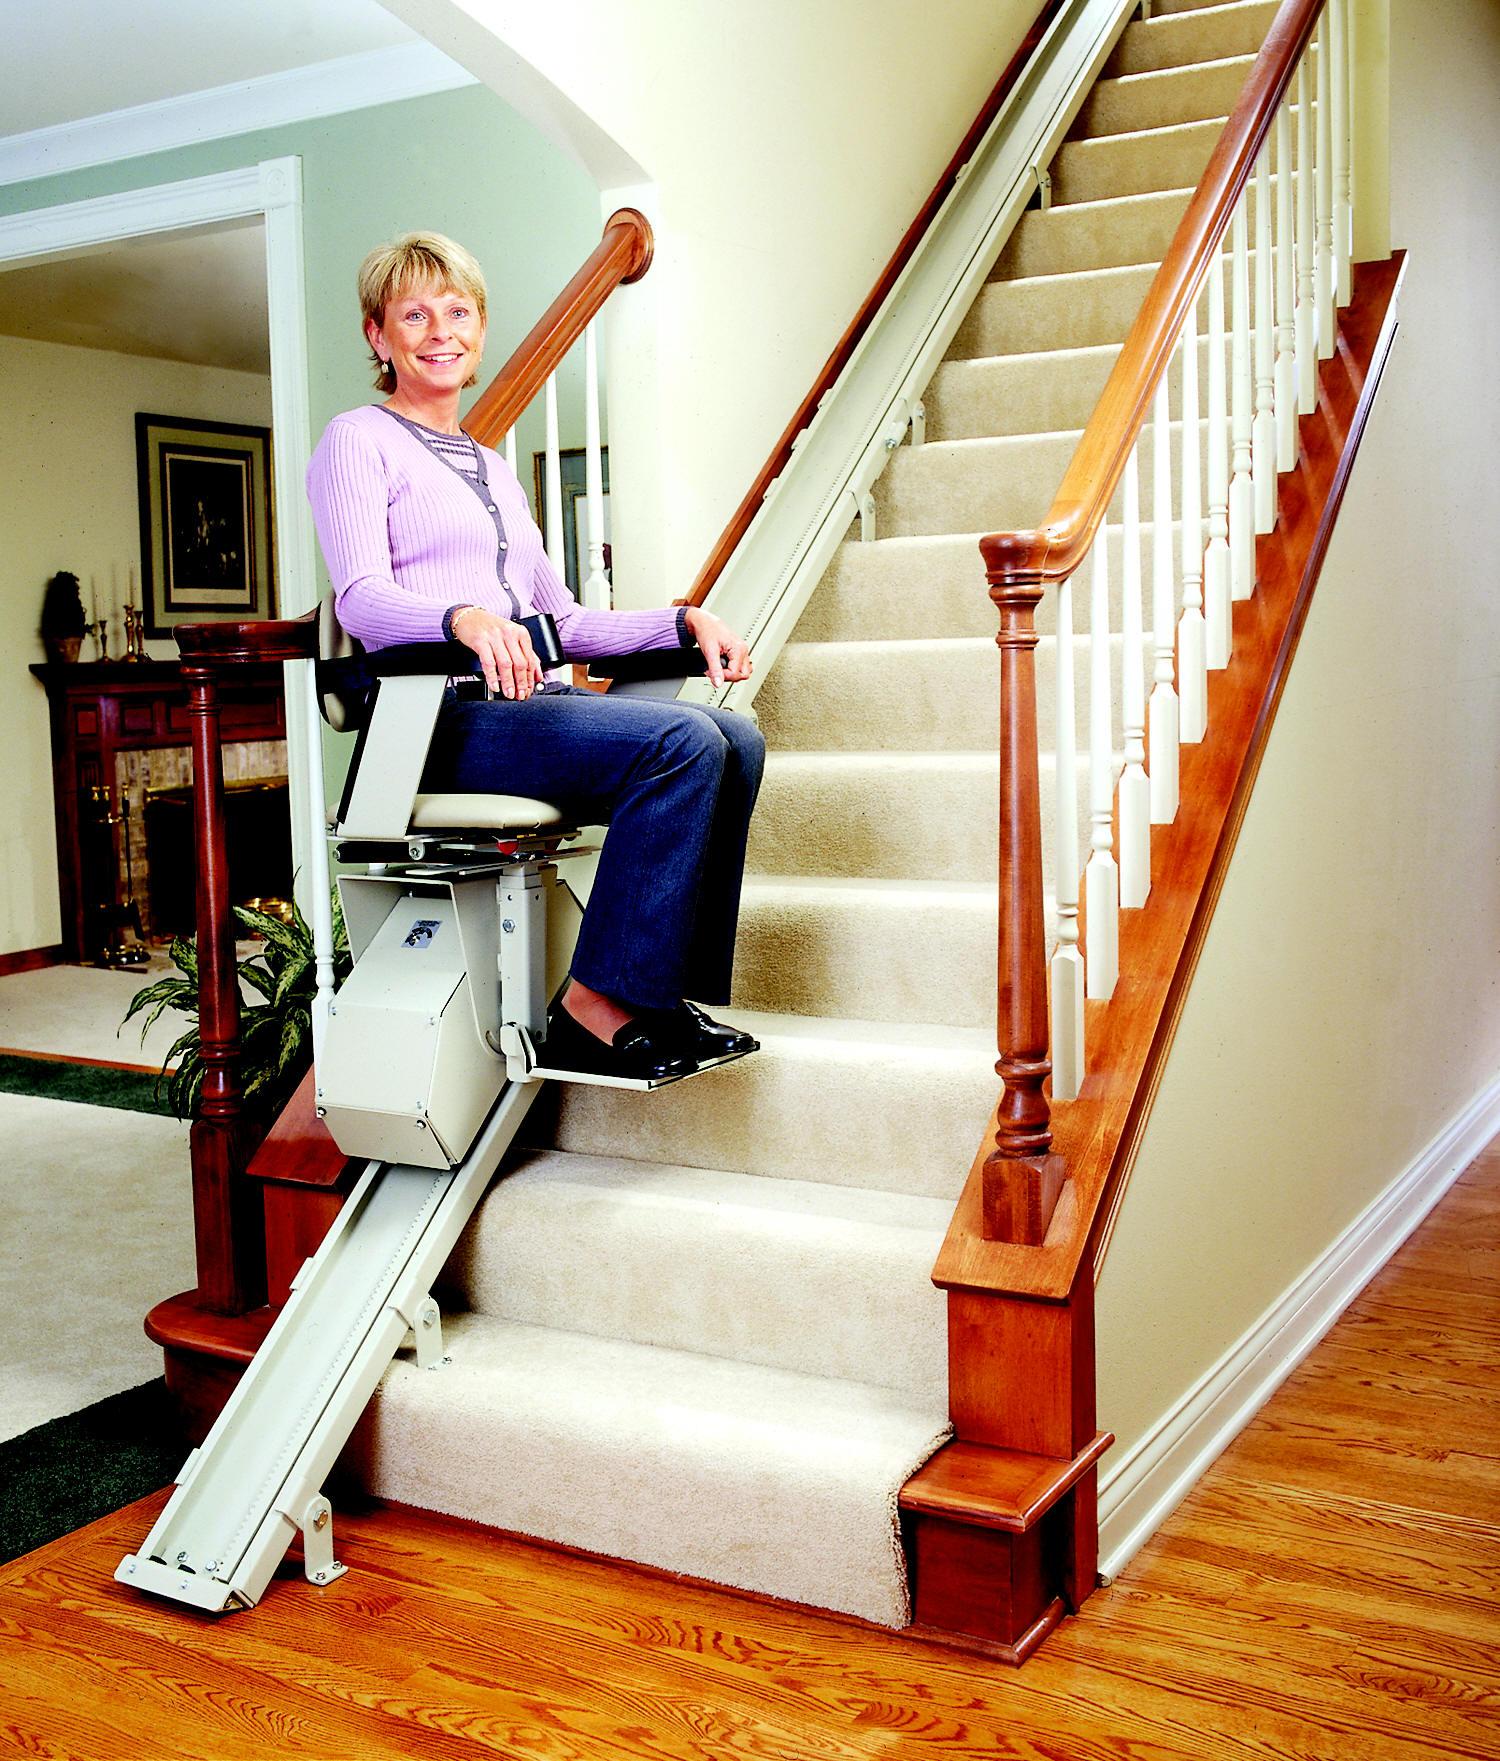 Los Angelesused Bruno Residential SRE-1550 Stair Lifts